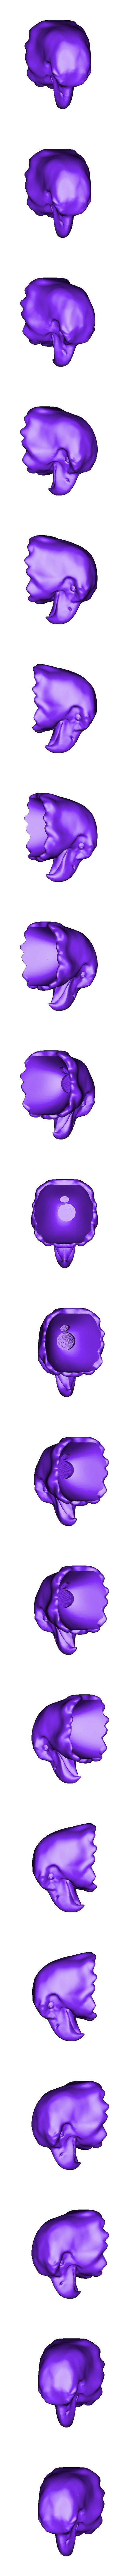 Bald_Eagle_head.stl Download free OBJ file Eagle Lamp/Nightlight • 3D printable template, Pza4Rza